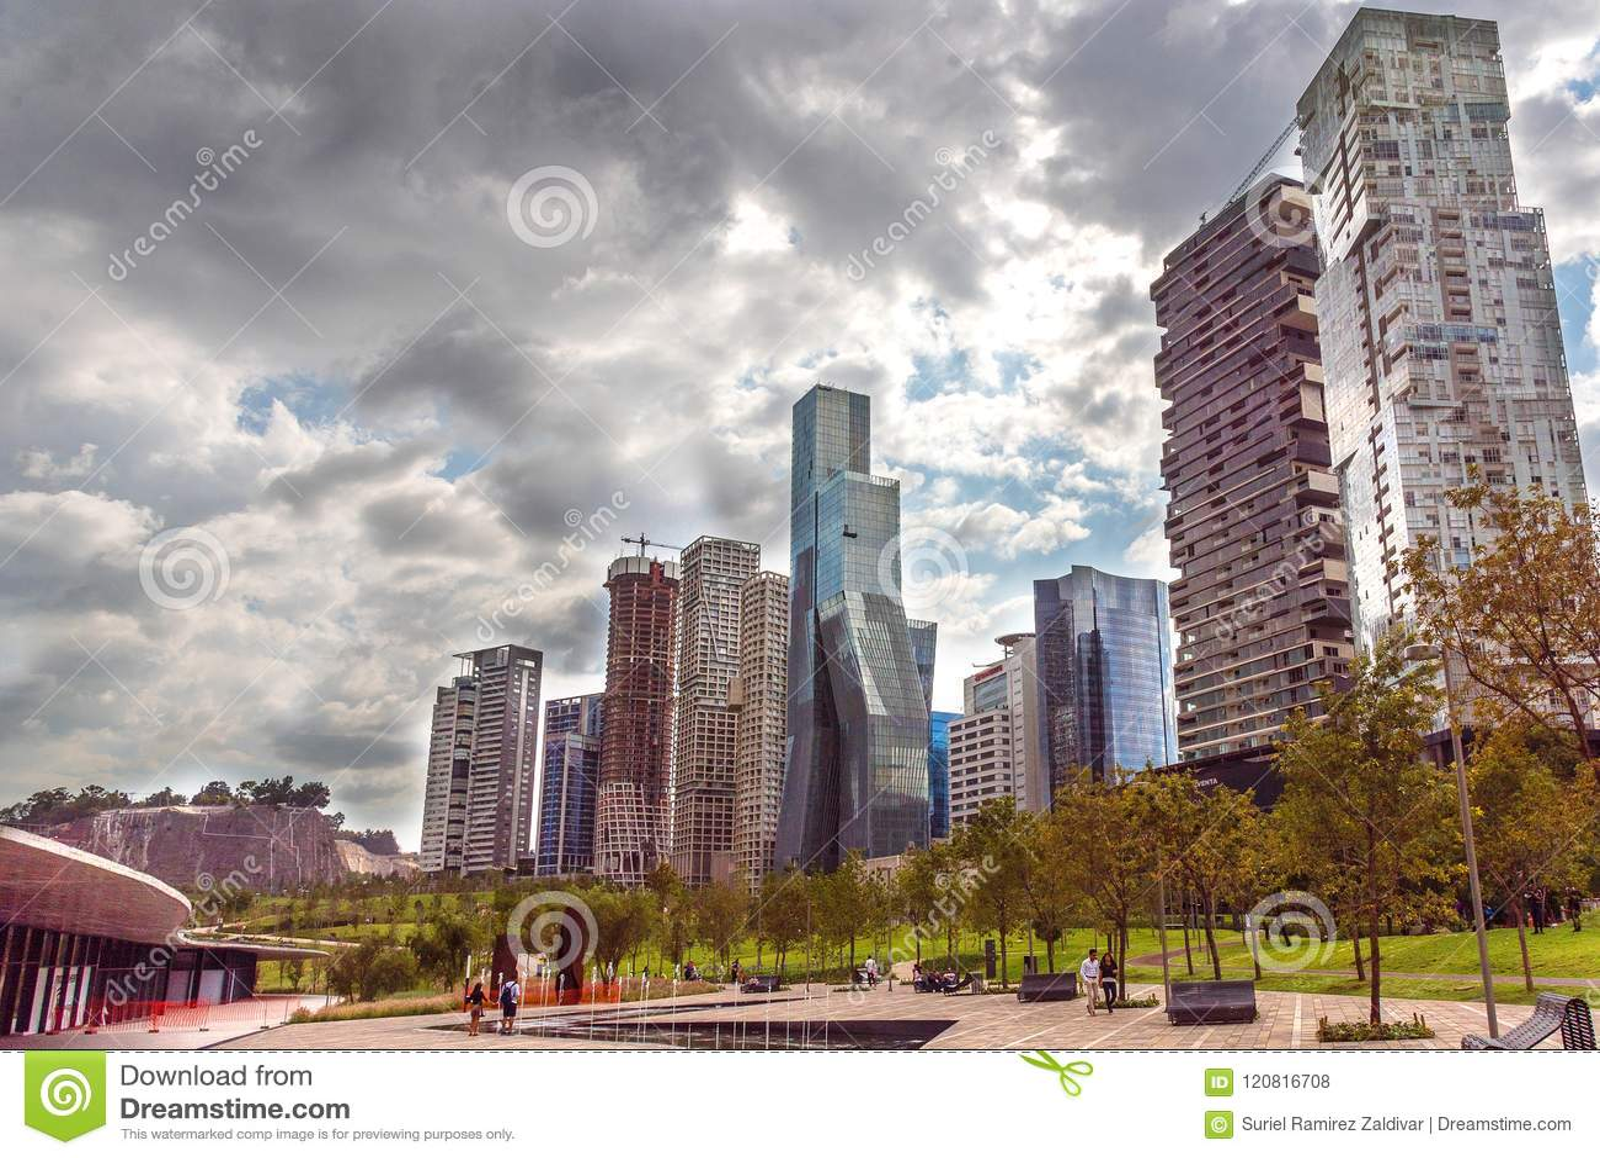 Mexico City Santa Fe Buildings Editorial Stock Photo Image Of Panoramic Modern 120816708